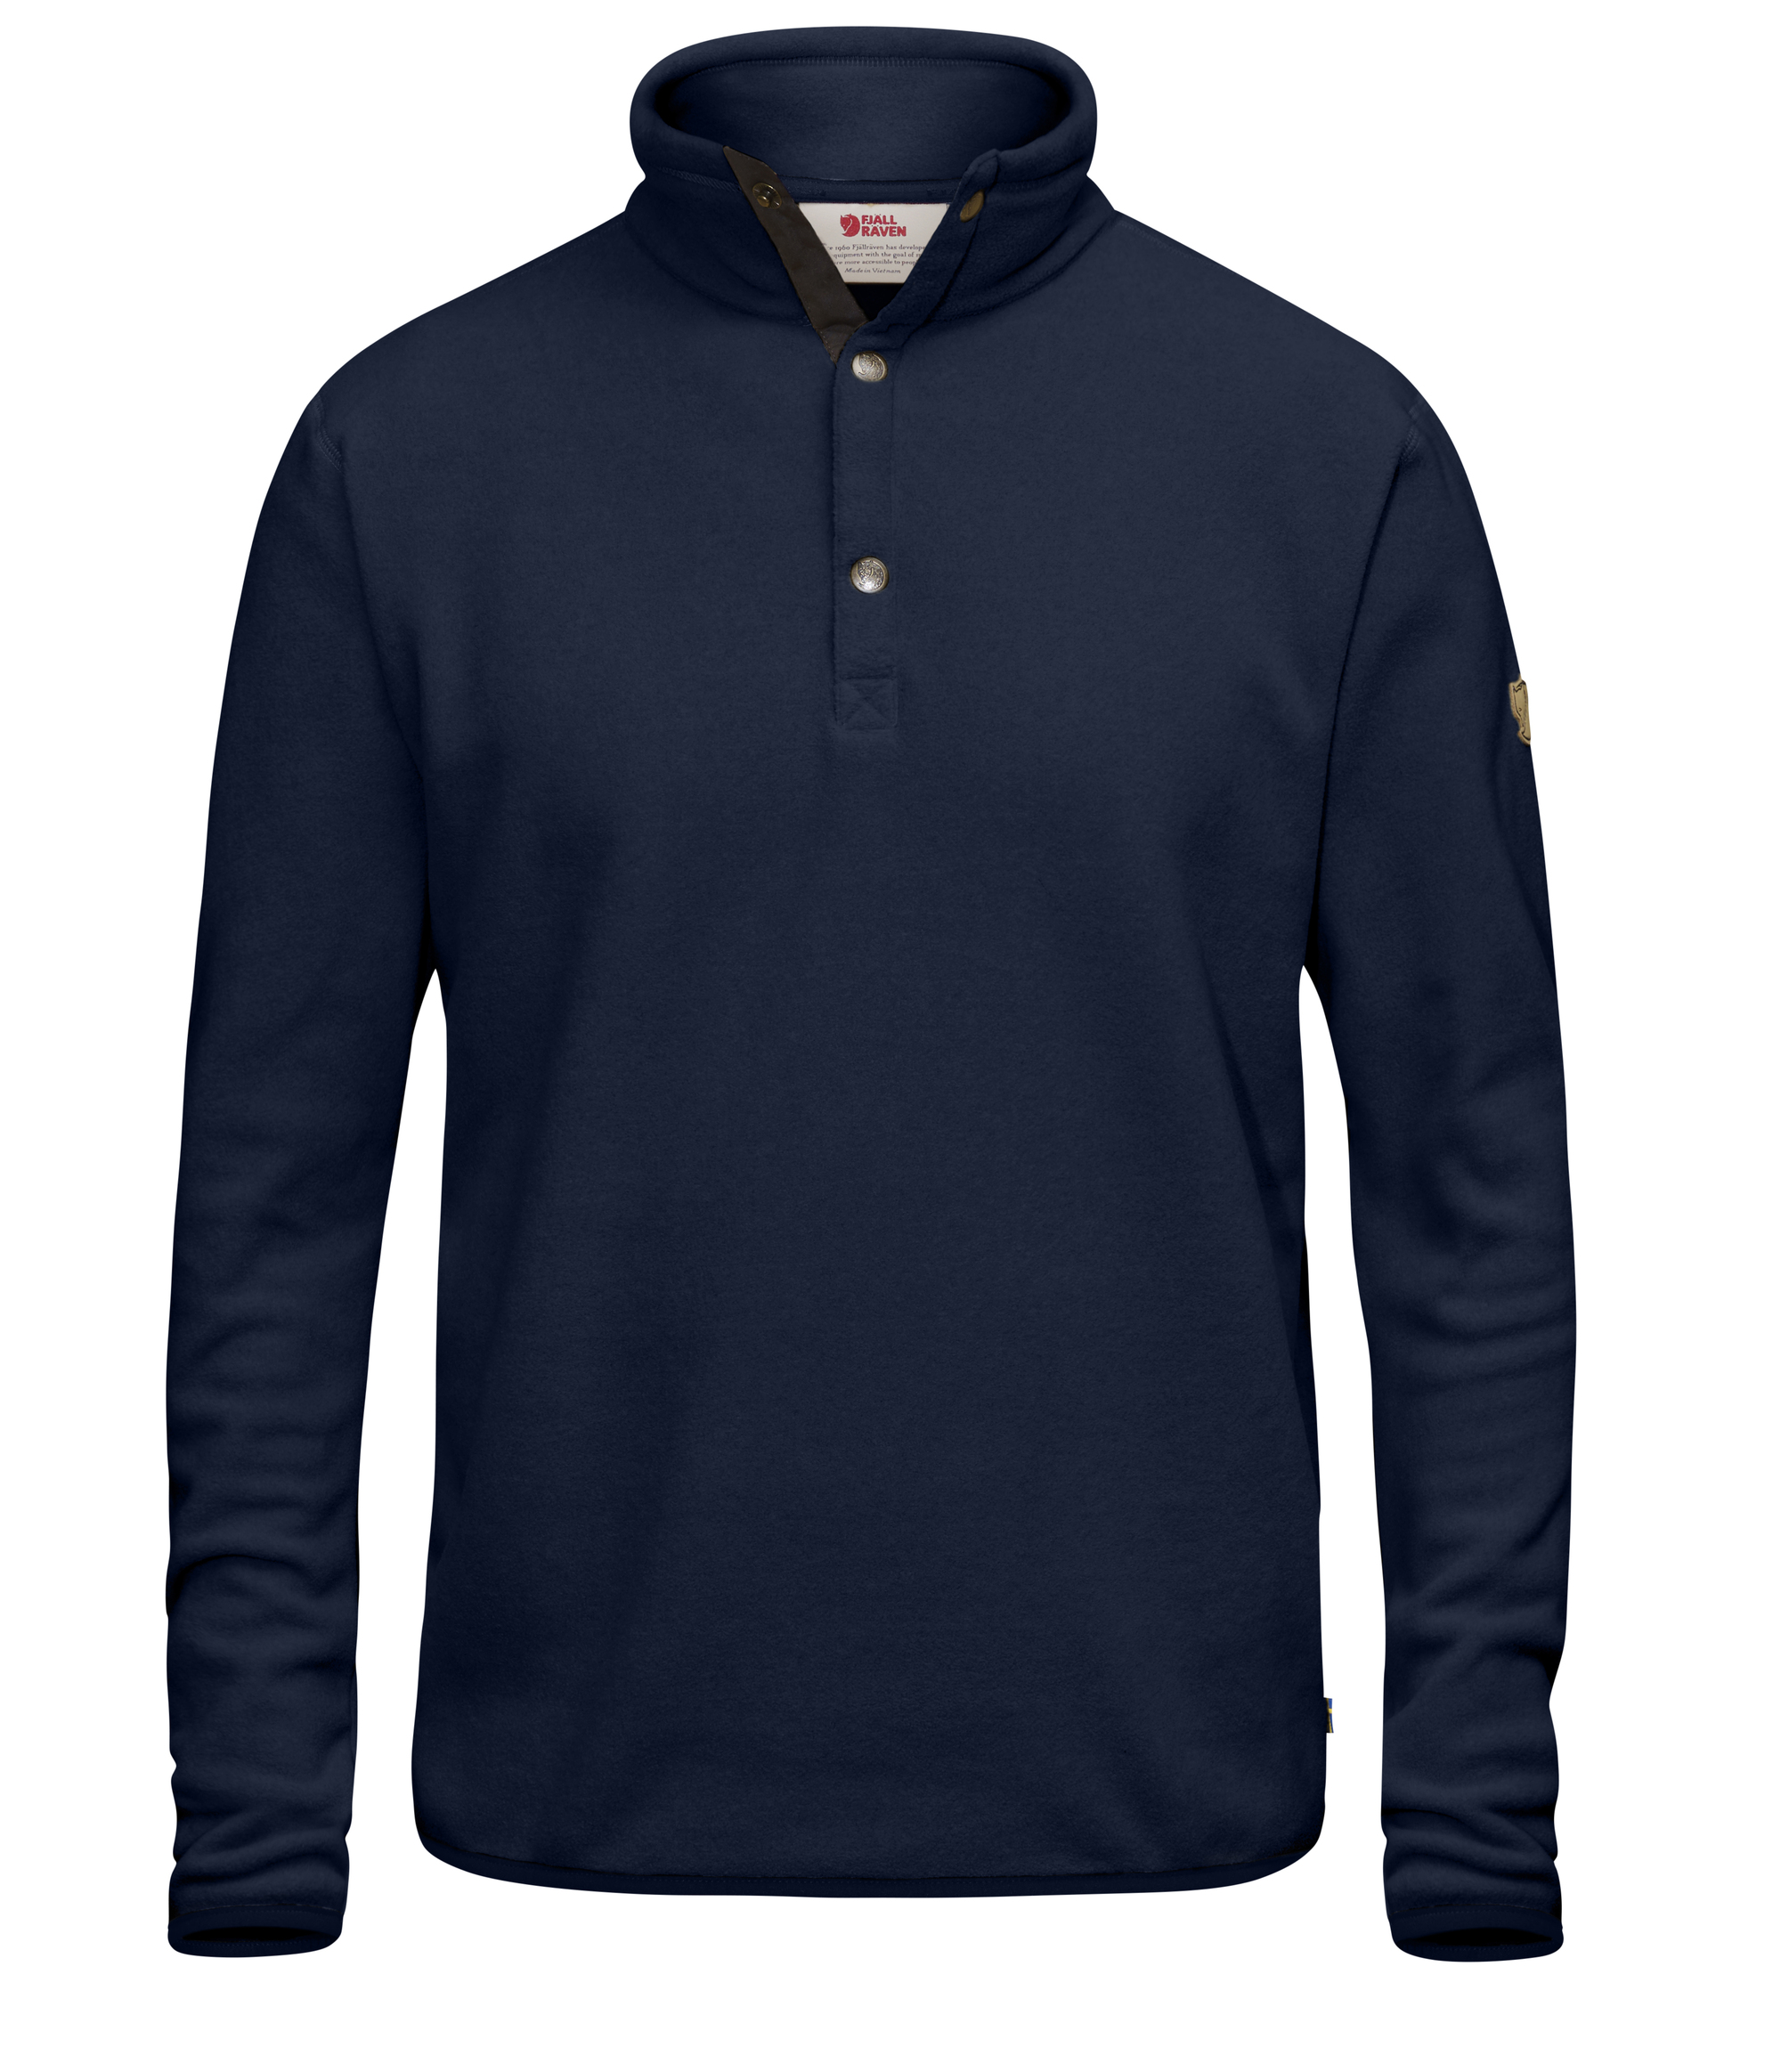 FJ/ÄLLR/ÄVEN Mens /Övik Fleece Sweater